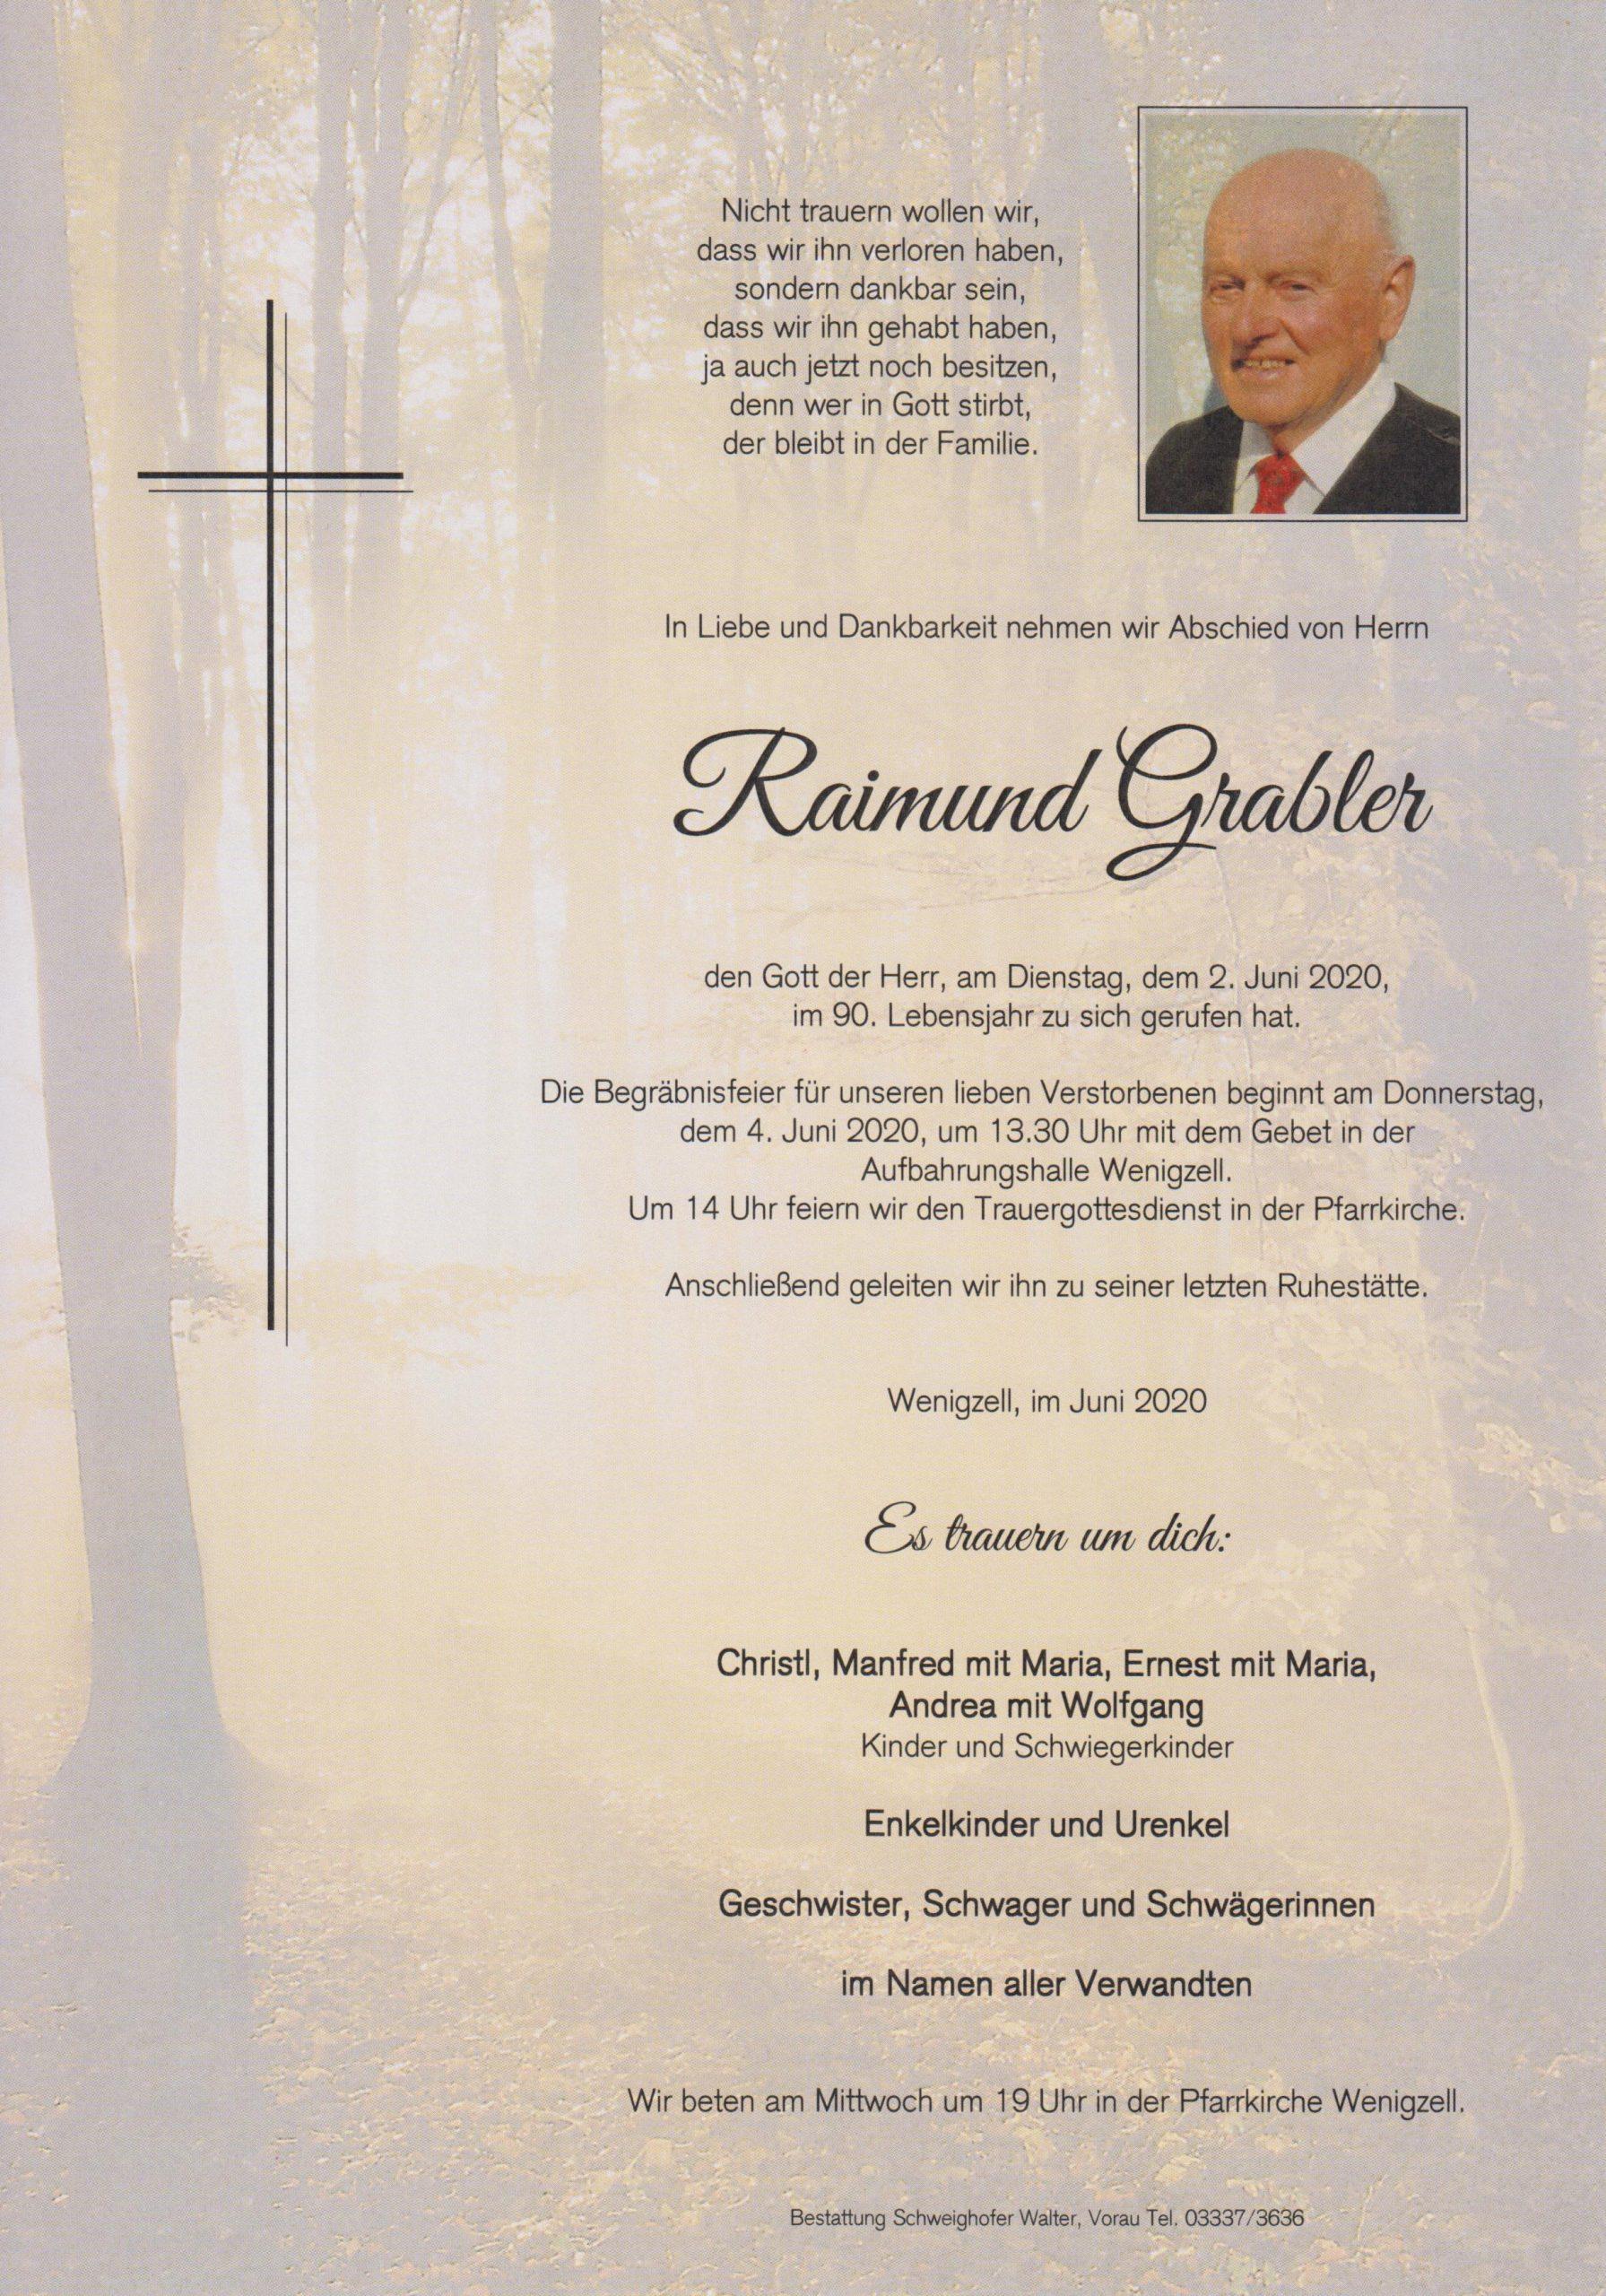 Raimund Grabler